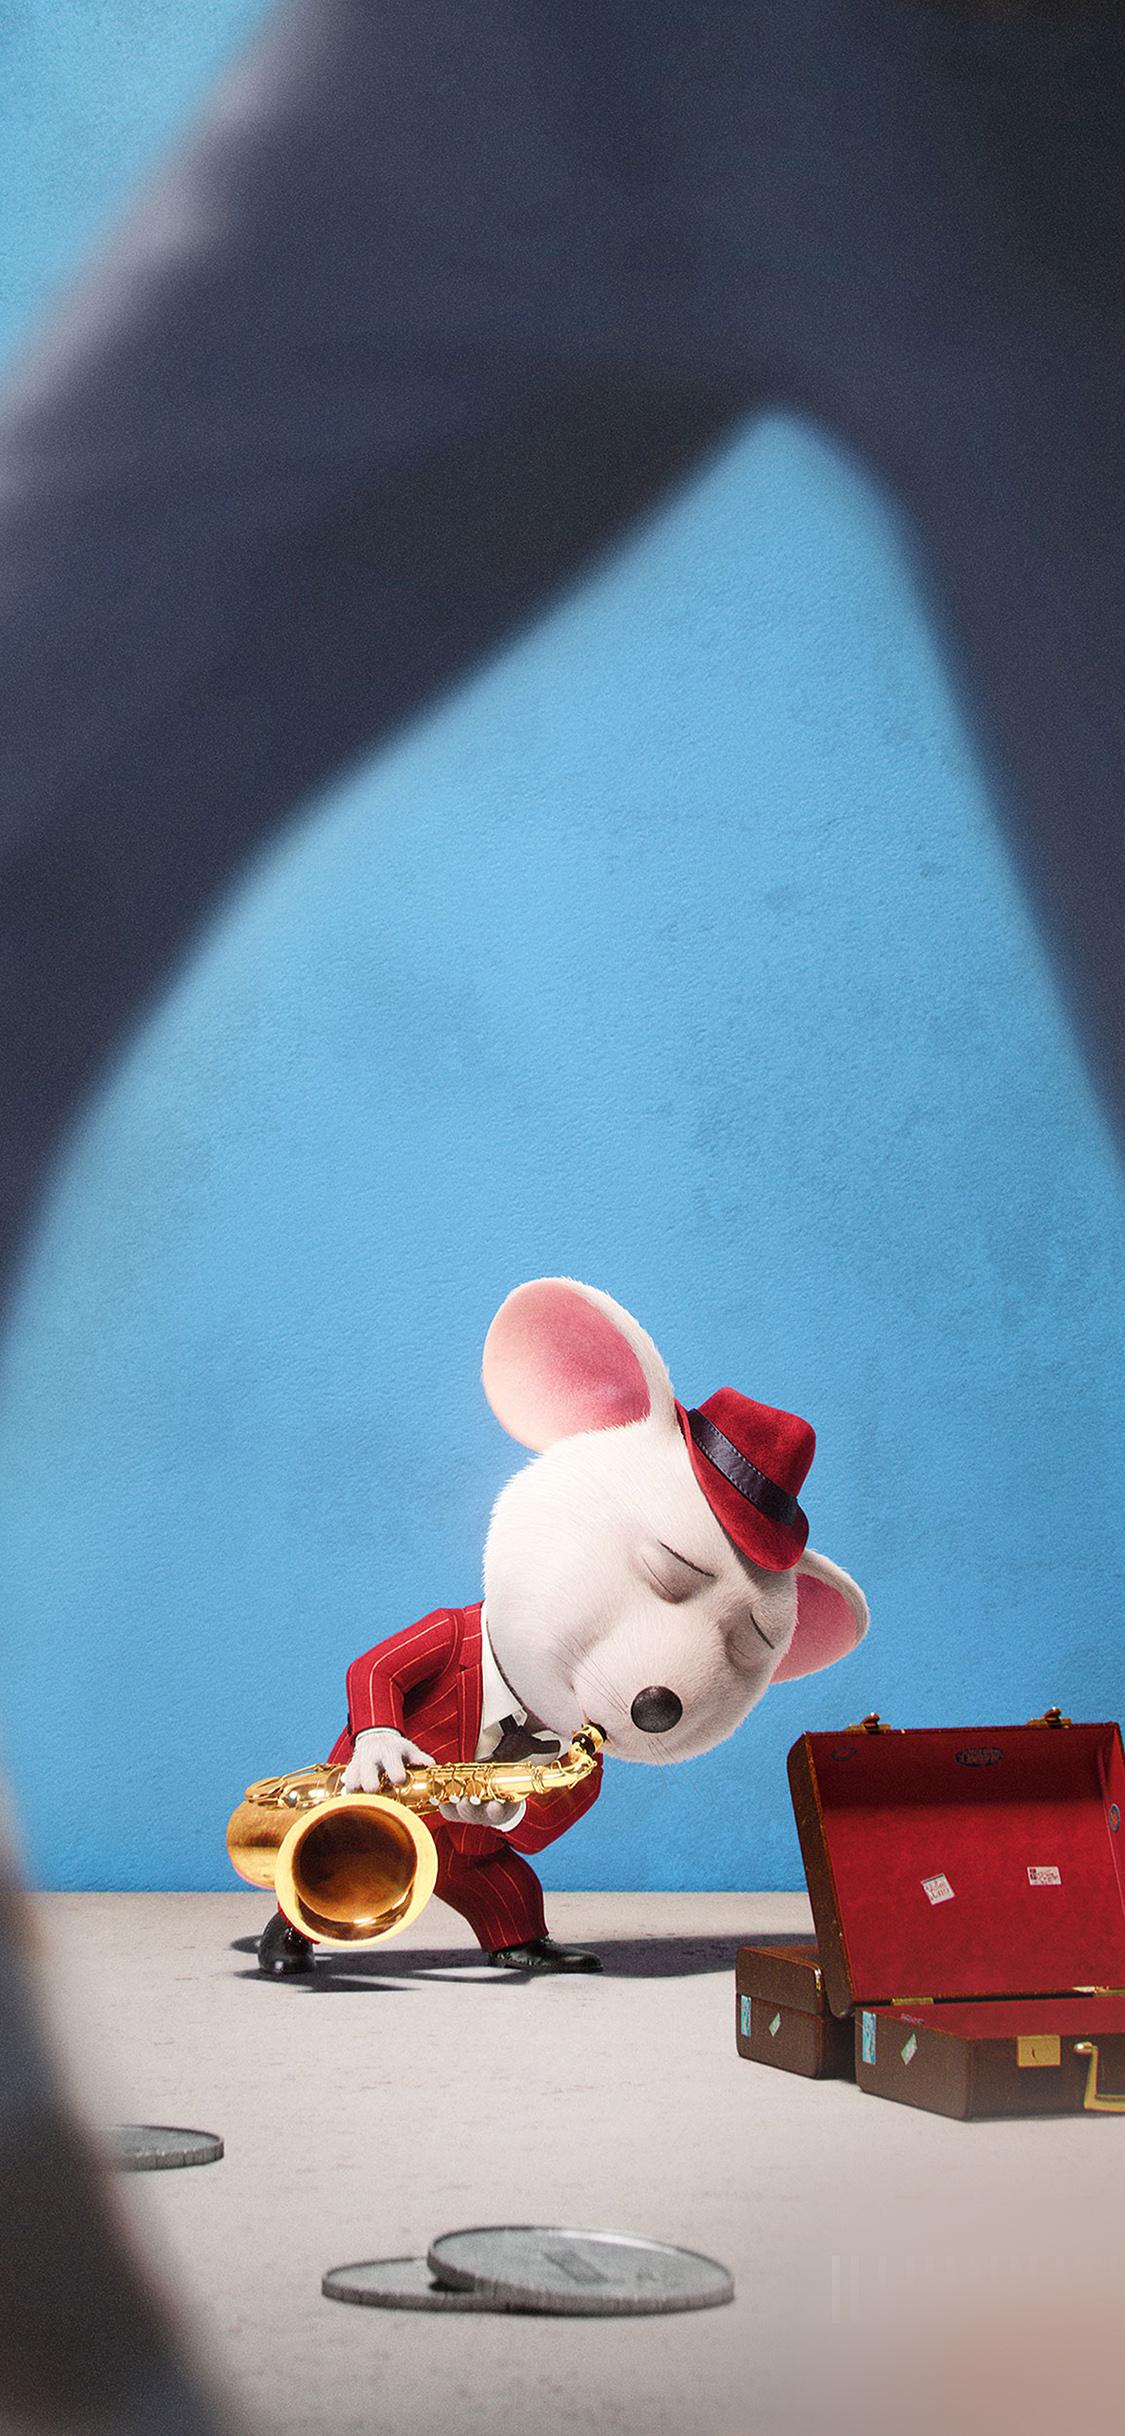 iPhoneXpapers.com-Apple-iPhone-wallpaper-av99-sing-film-poster-animation-cute-illustration-art